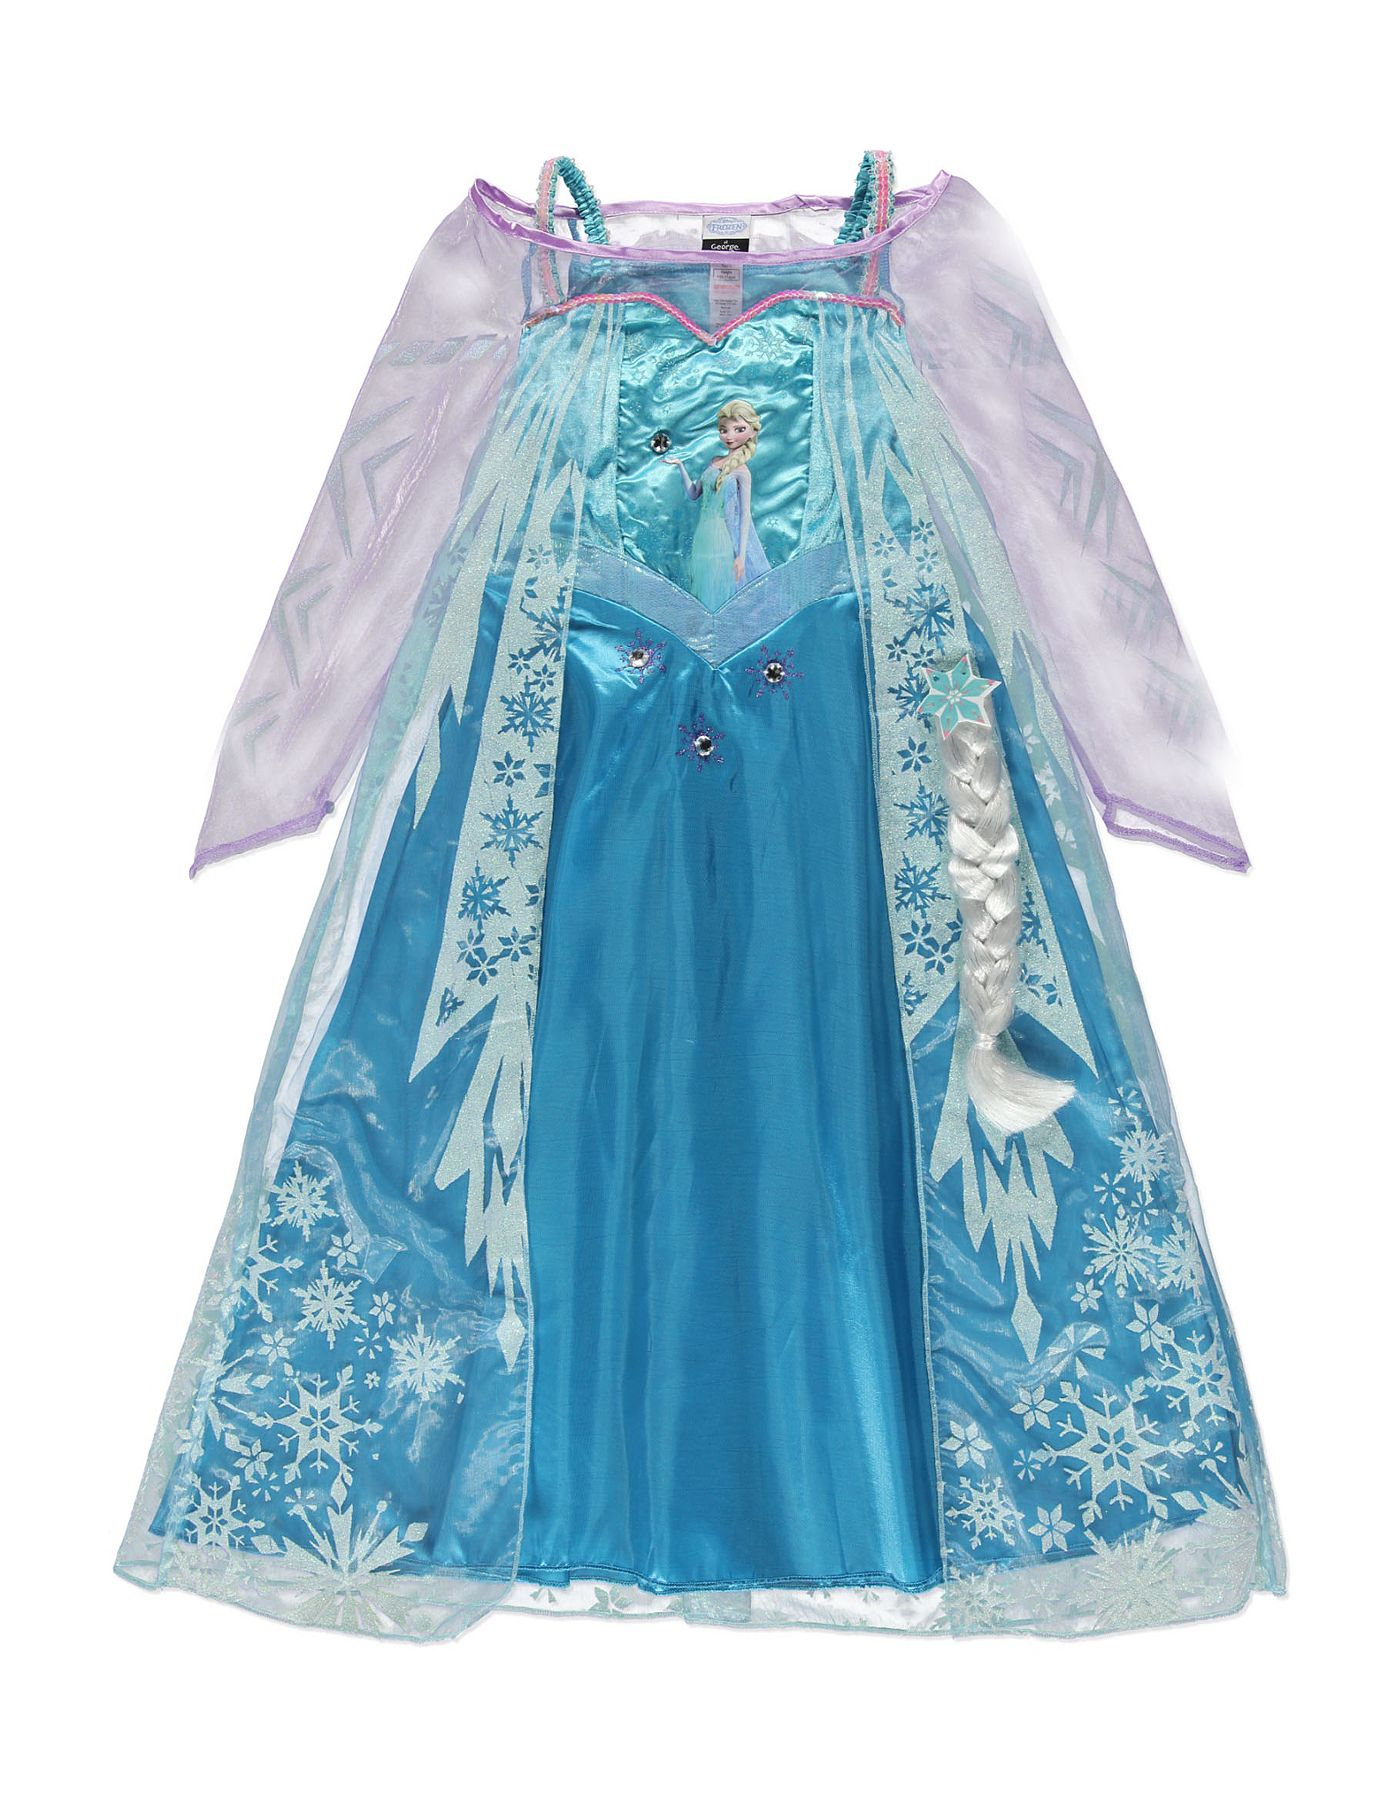 Fingerless gloves asda - Elsa Fancy Dress Costume Girls George At Asda